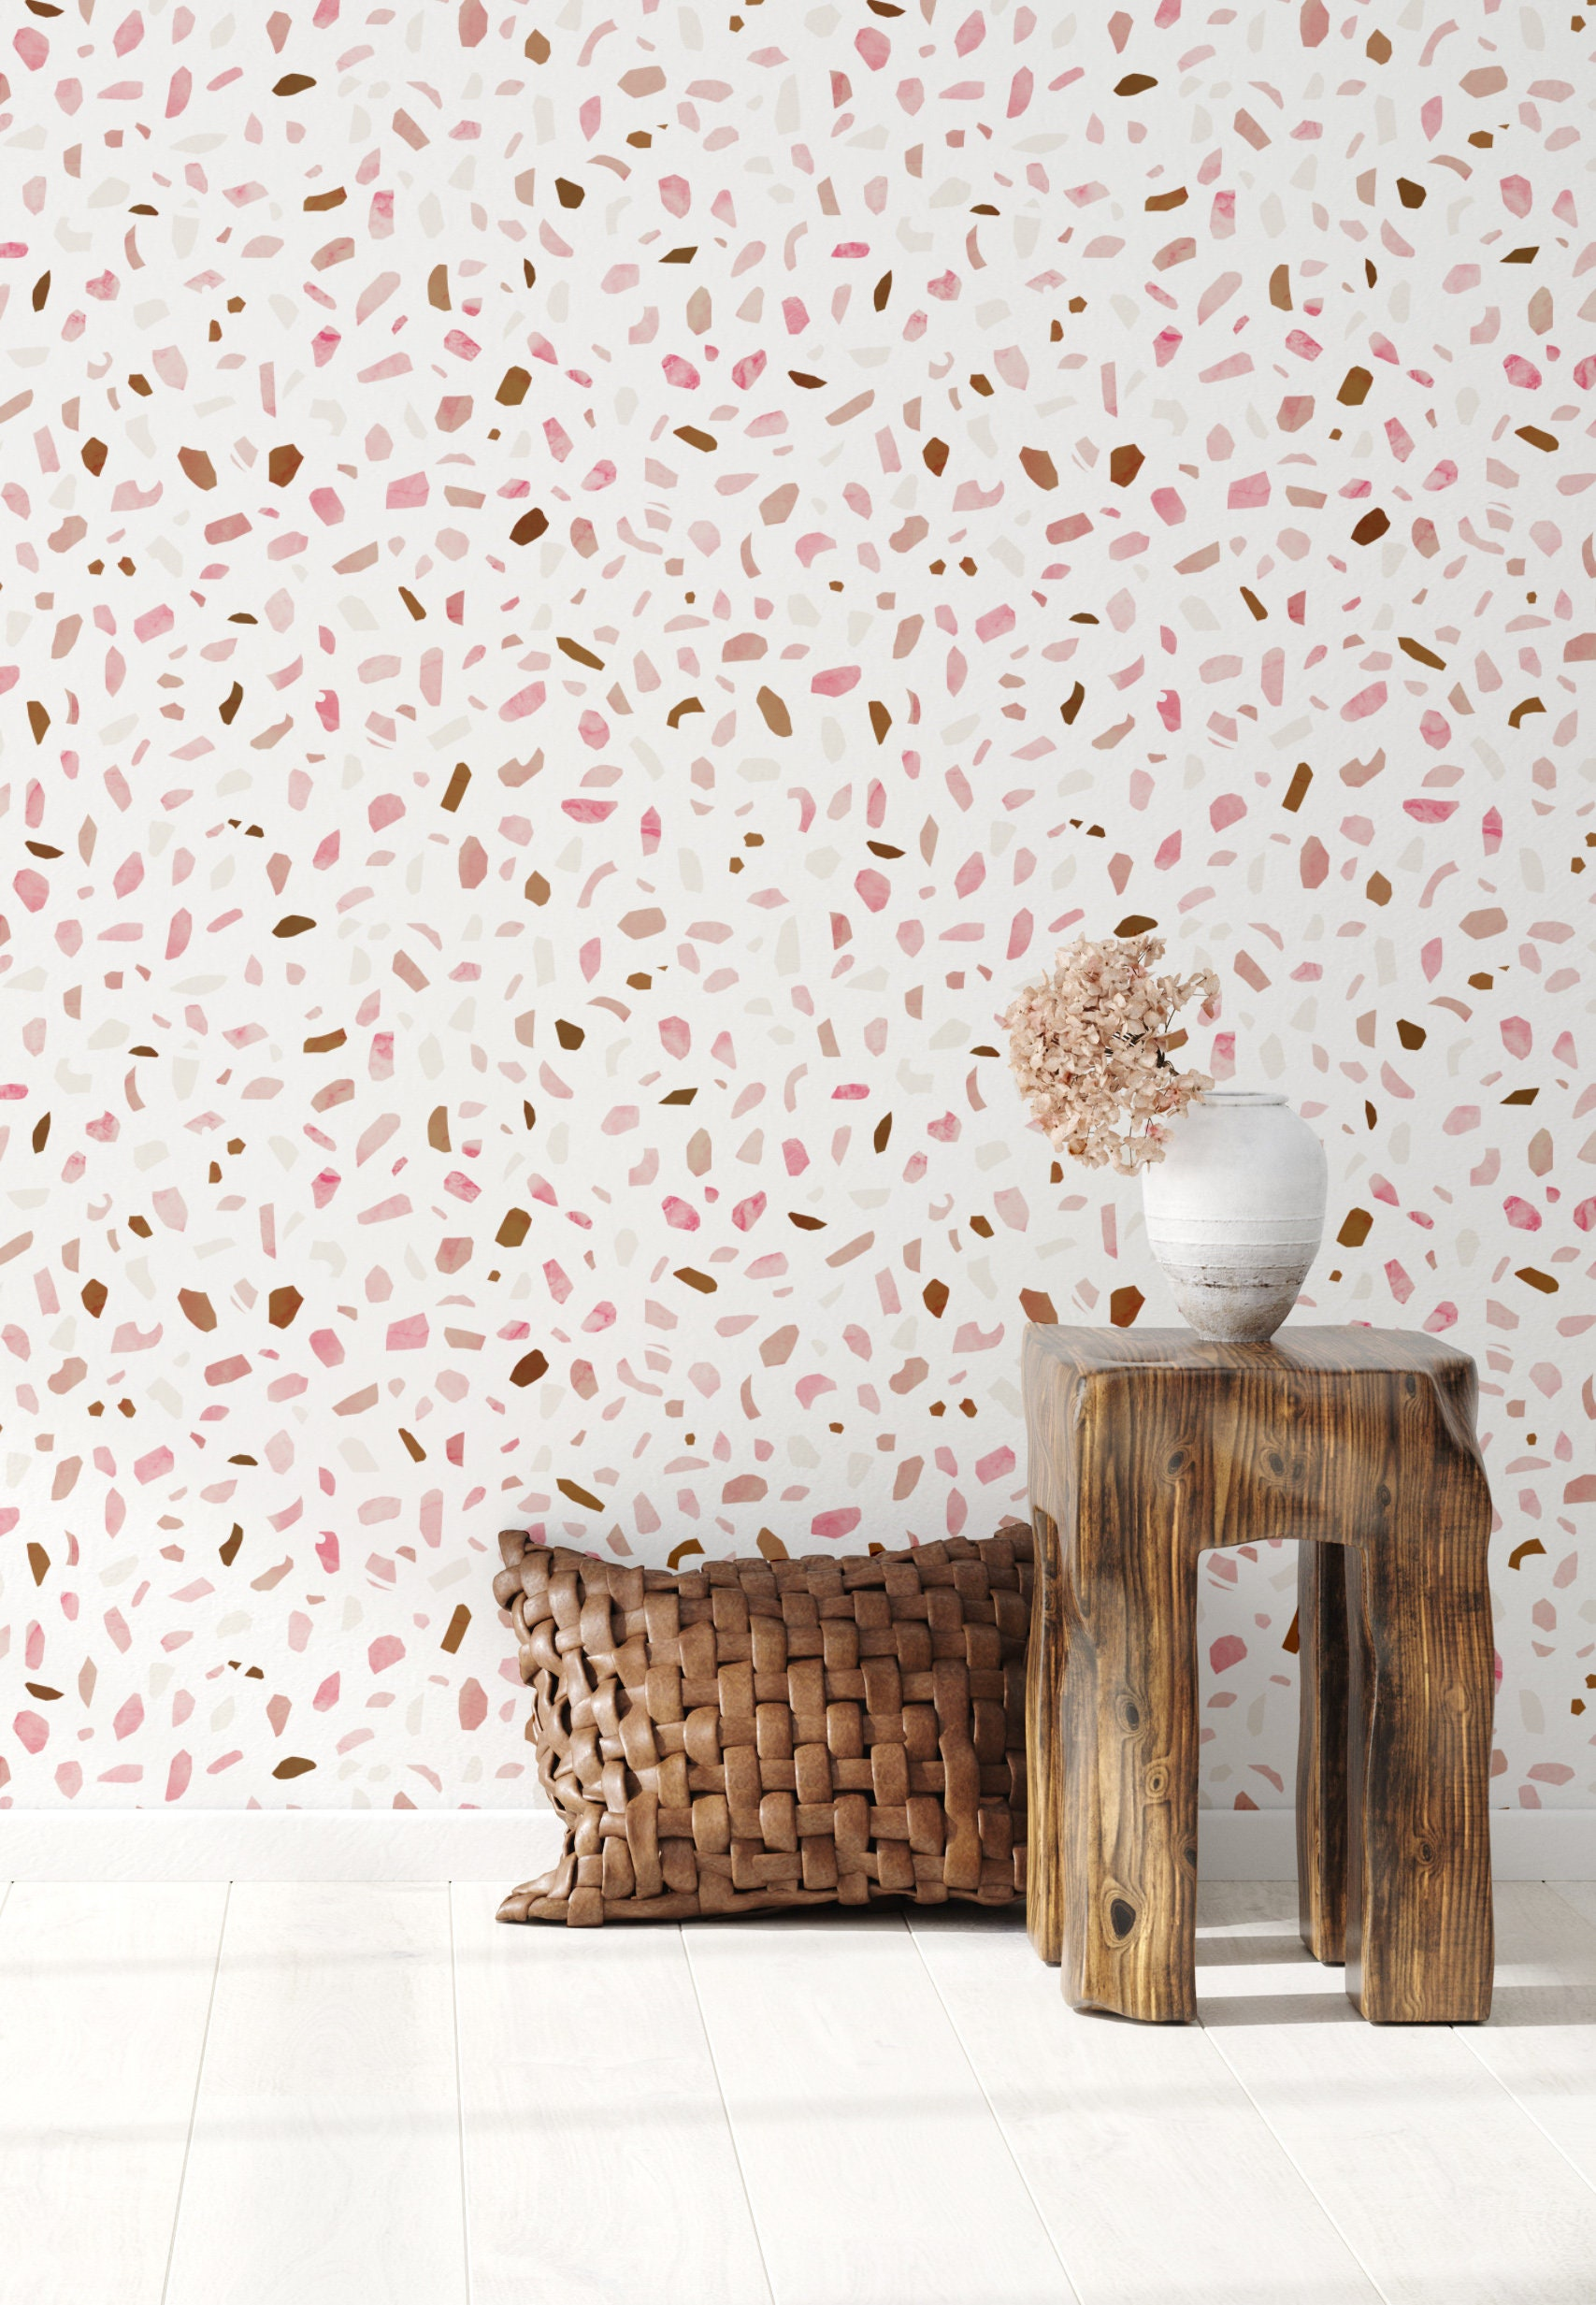 Pink Terrazzo Wallpaper Abstract Wallpaper Removable Wallpaper Feminine Wallpaper Peel And Stick Wallpaper Office Decor